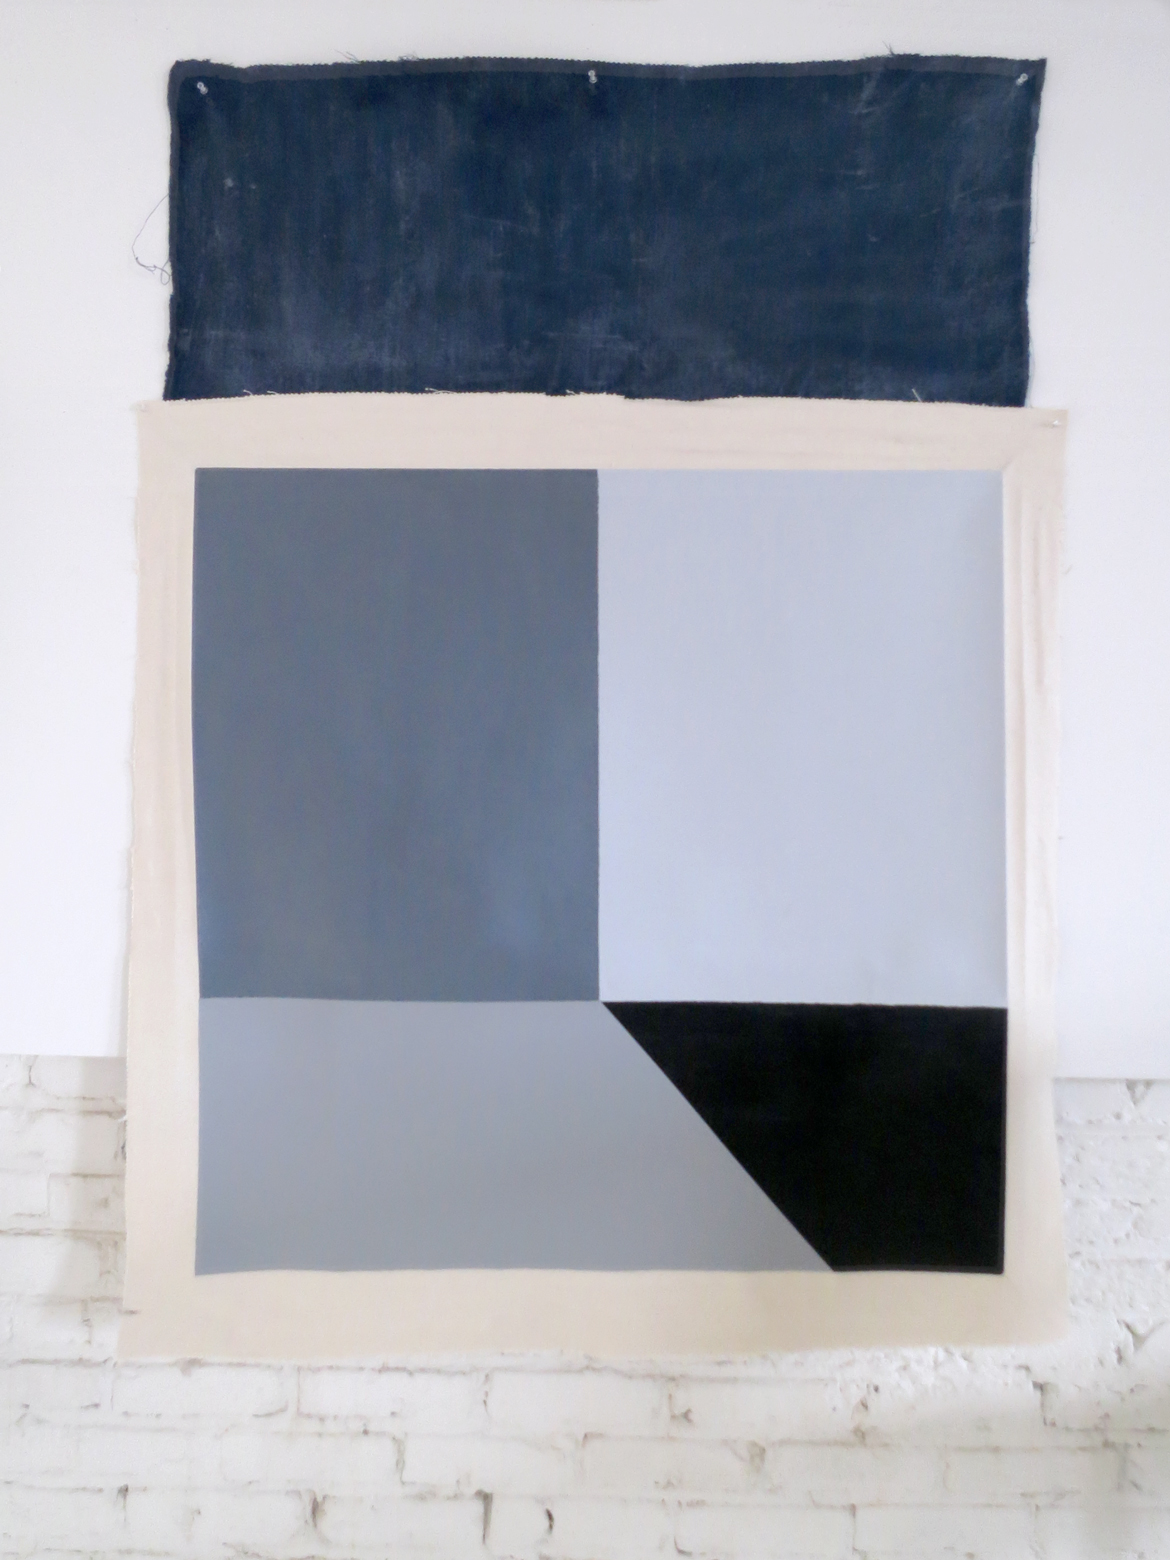 chadkouri-aslidingscalefromblacktowhite-uprise-offsite-process2